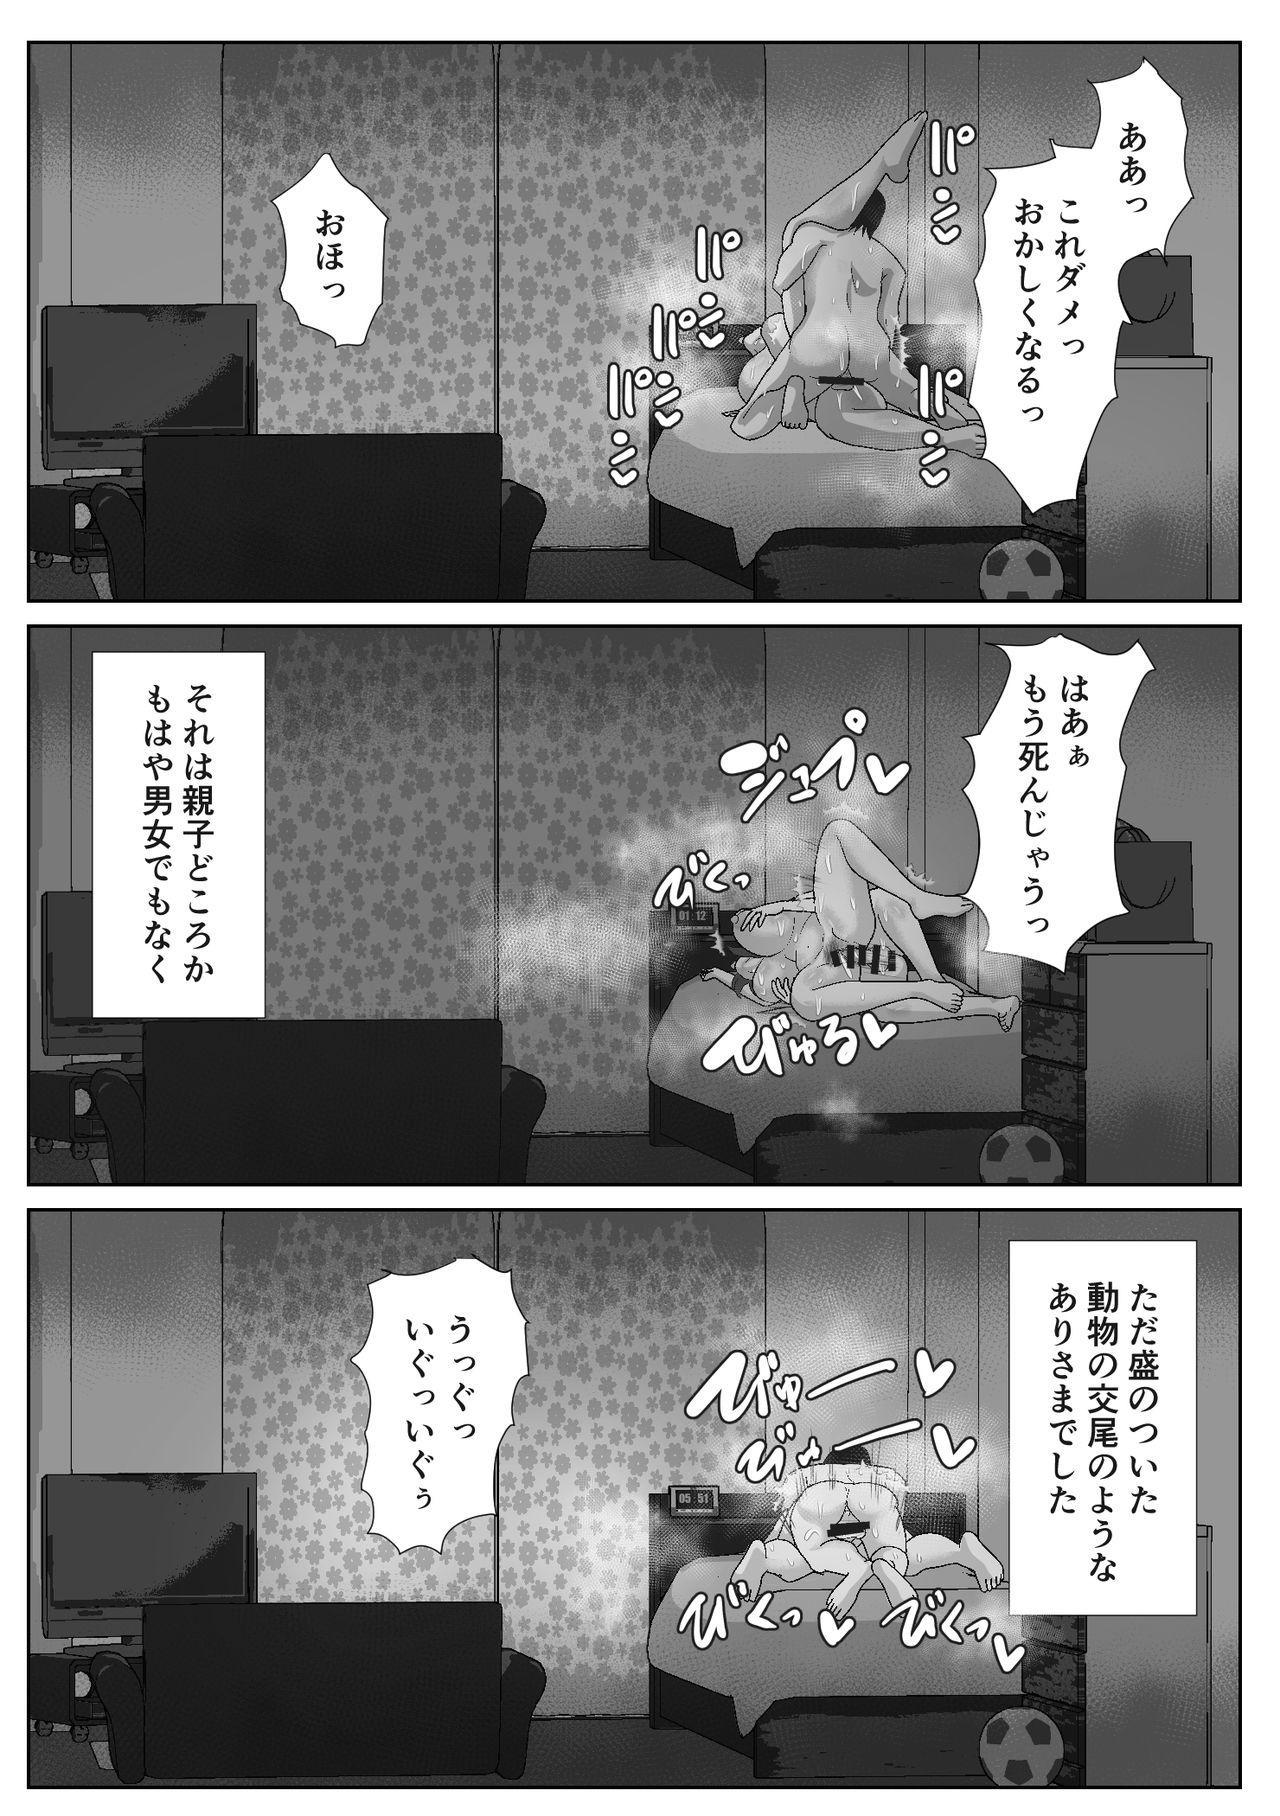 Kaa-san to Atsui Isshuukan 32